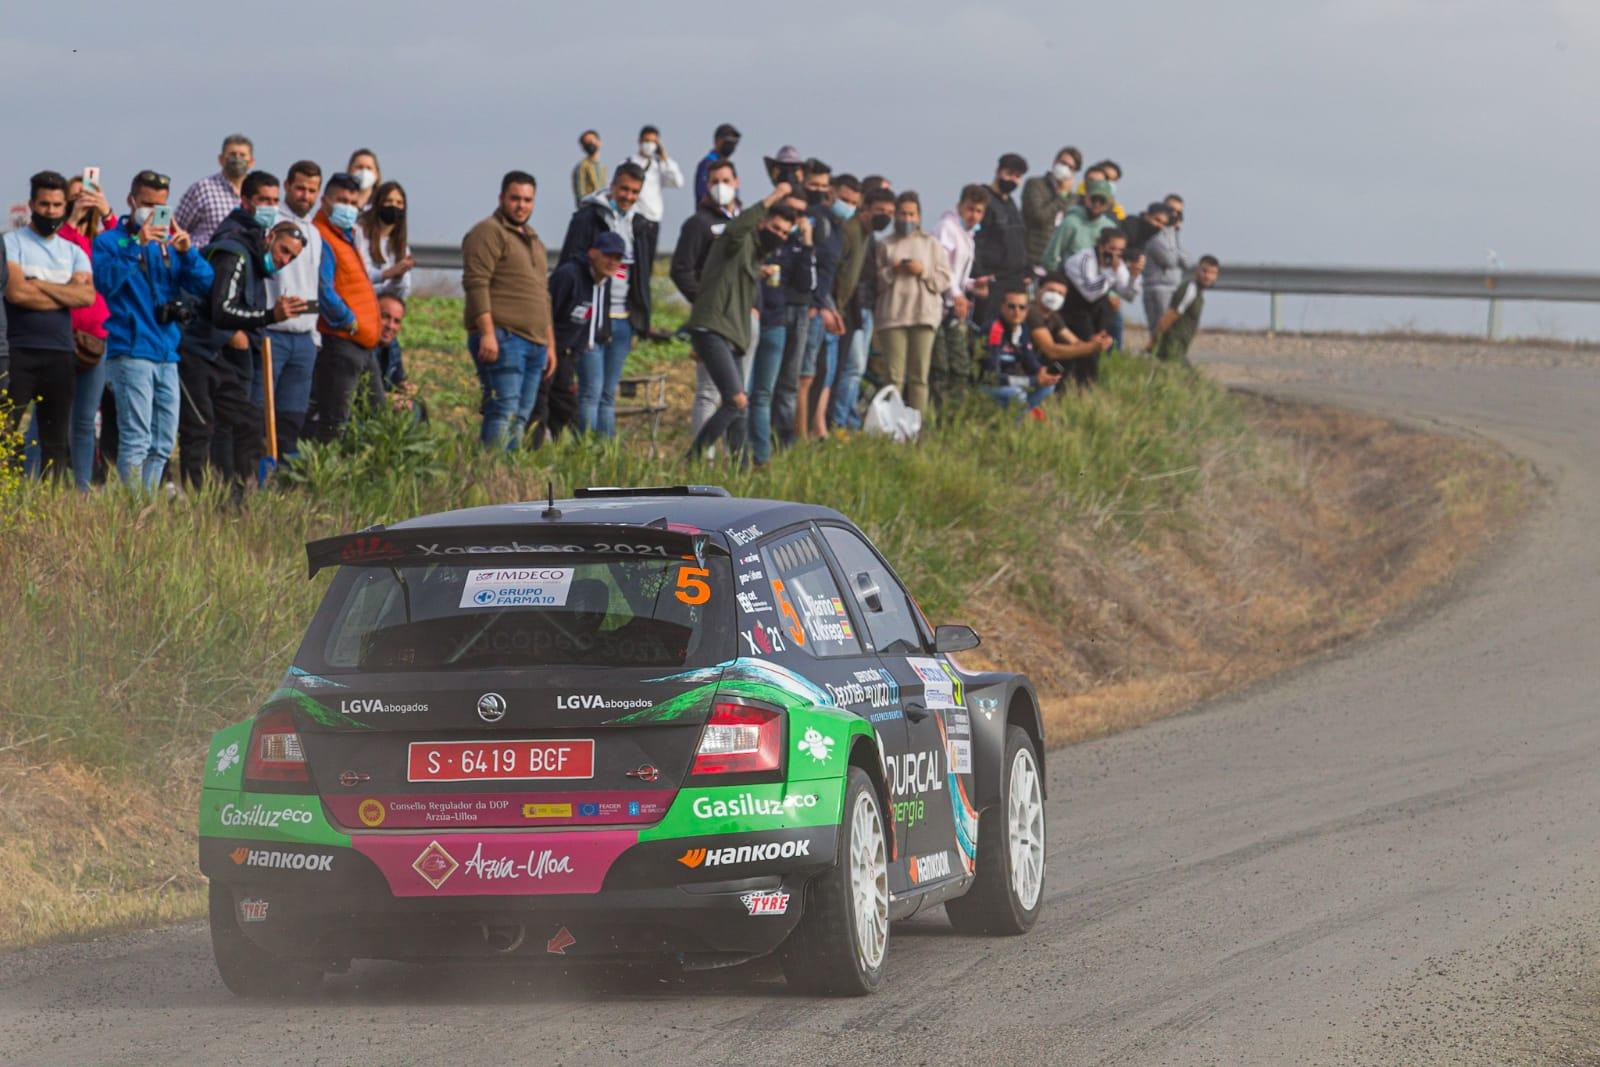 SCER + CERA + CERVH: 38º Rallye Sierra Morena - Internacional [8-10 Abril] - Página 3 EyhcaJZWgAQqT2e?format=jpg&name=large